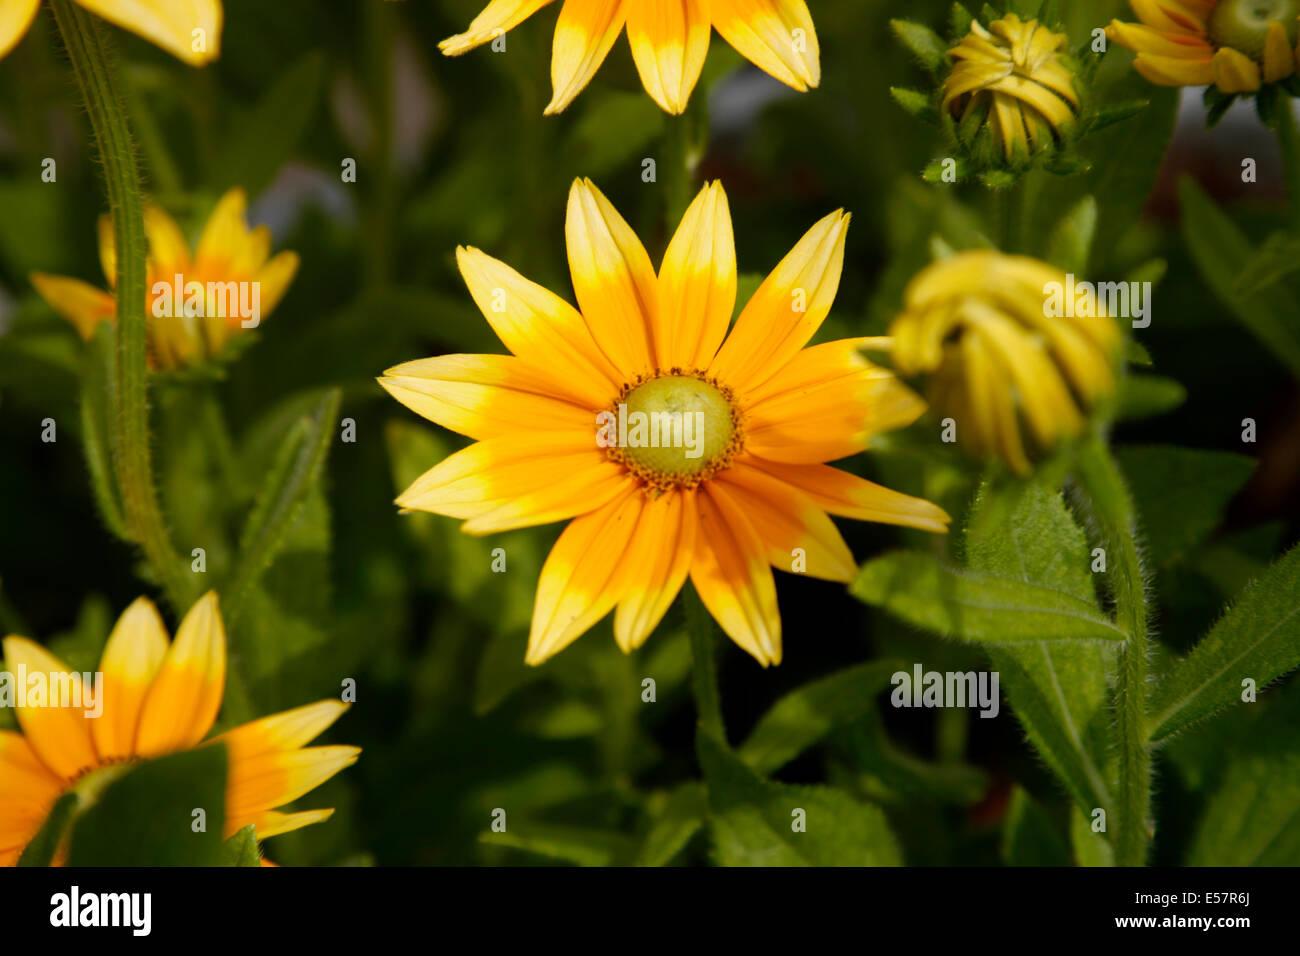 Prairie Sun Black Eyed Susan Features Yellow Orange Flowers It Is